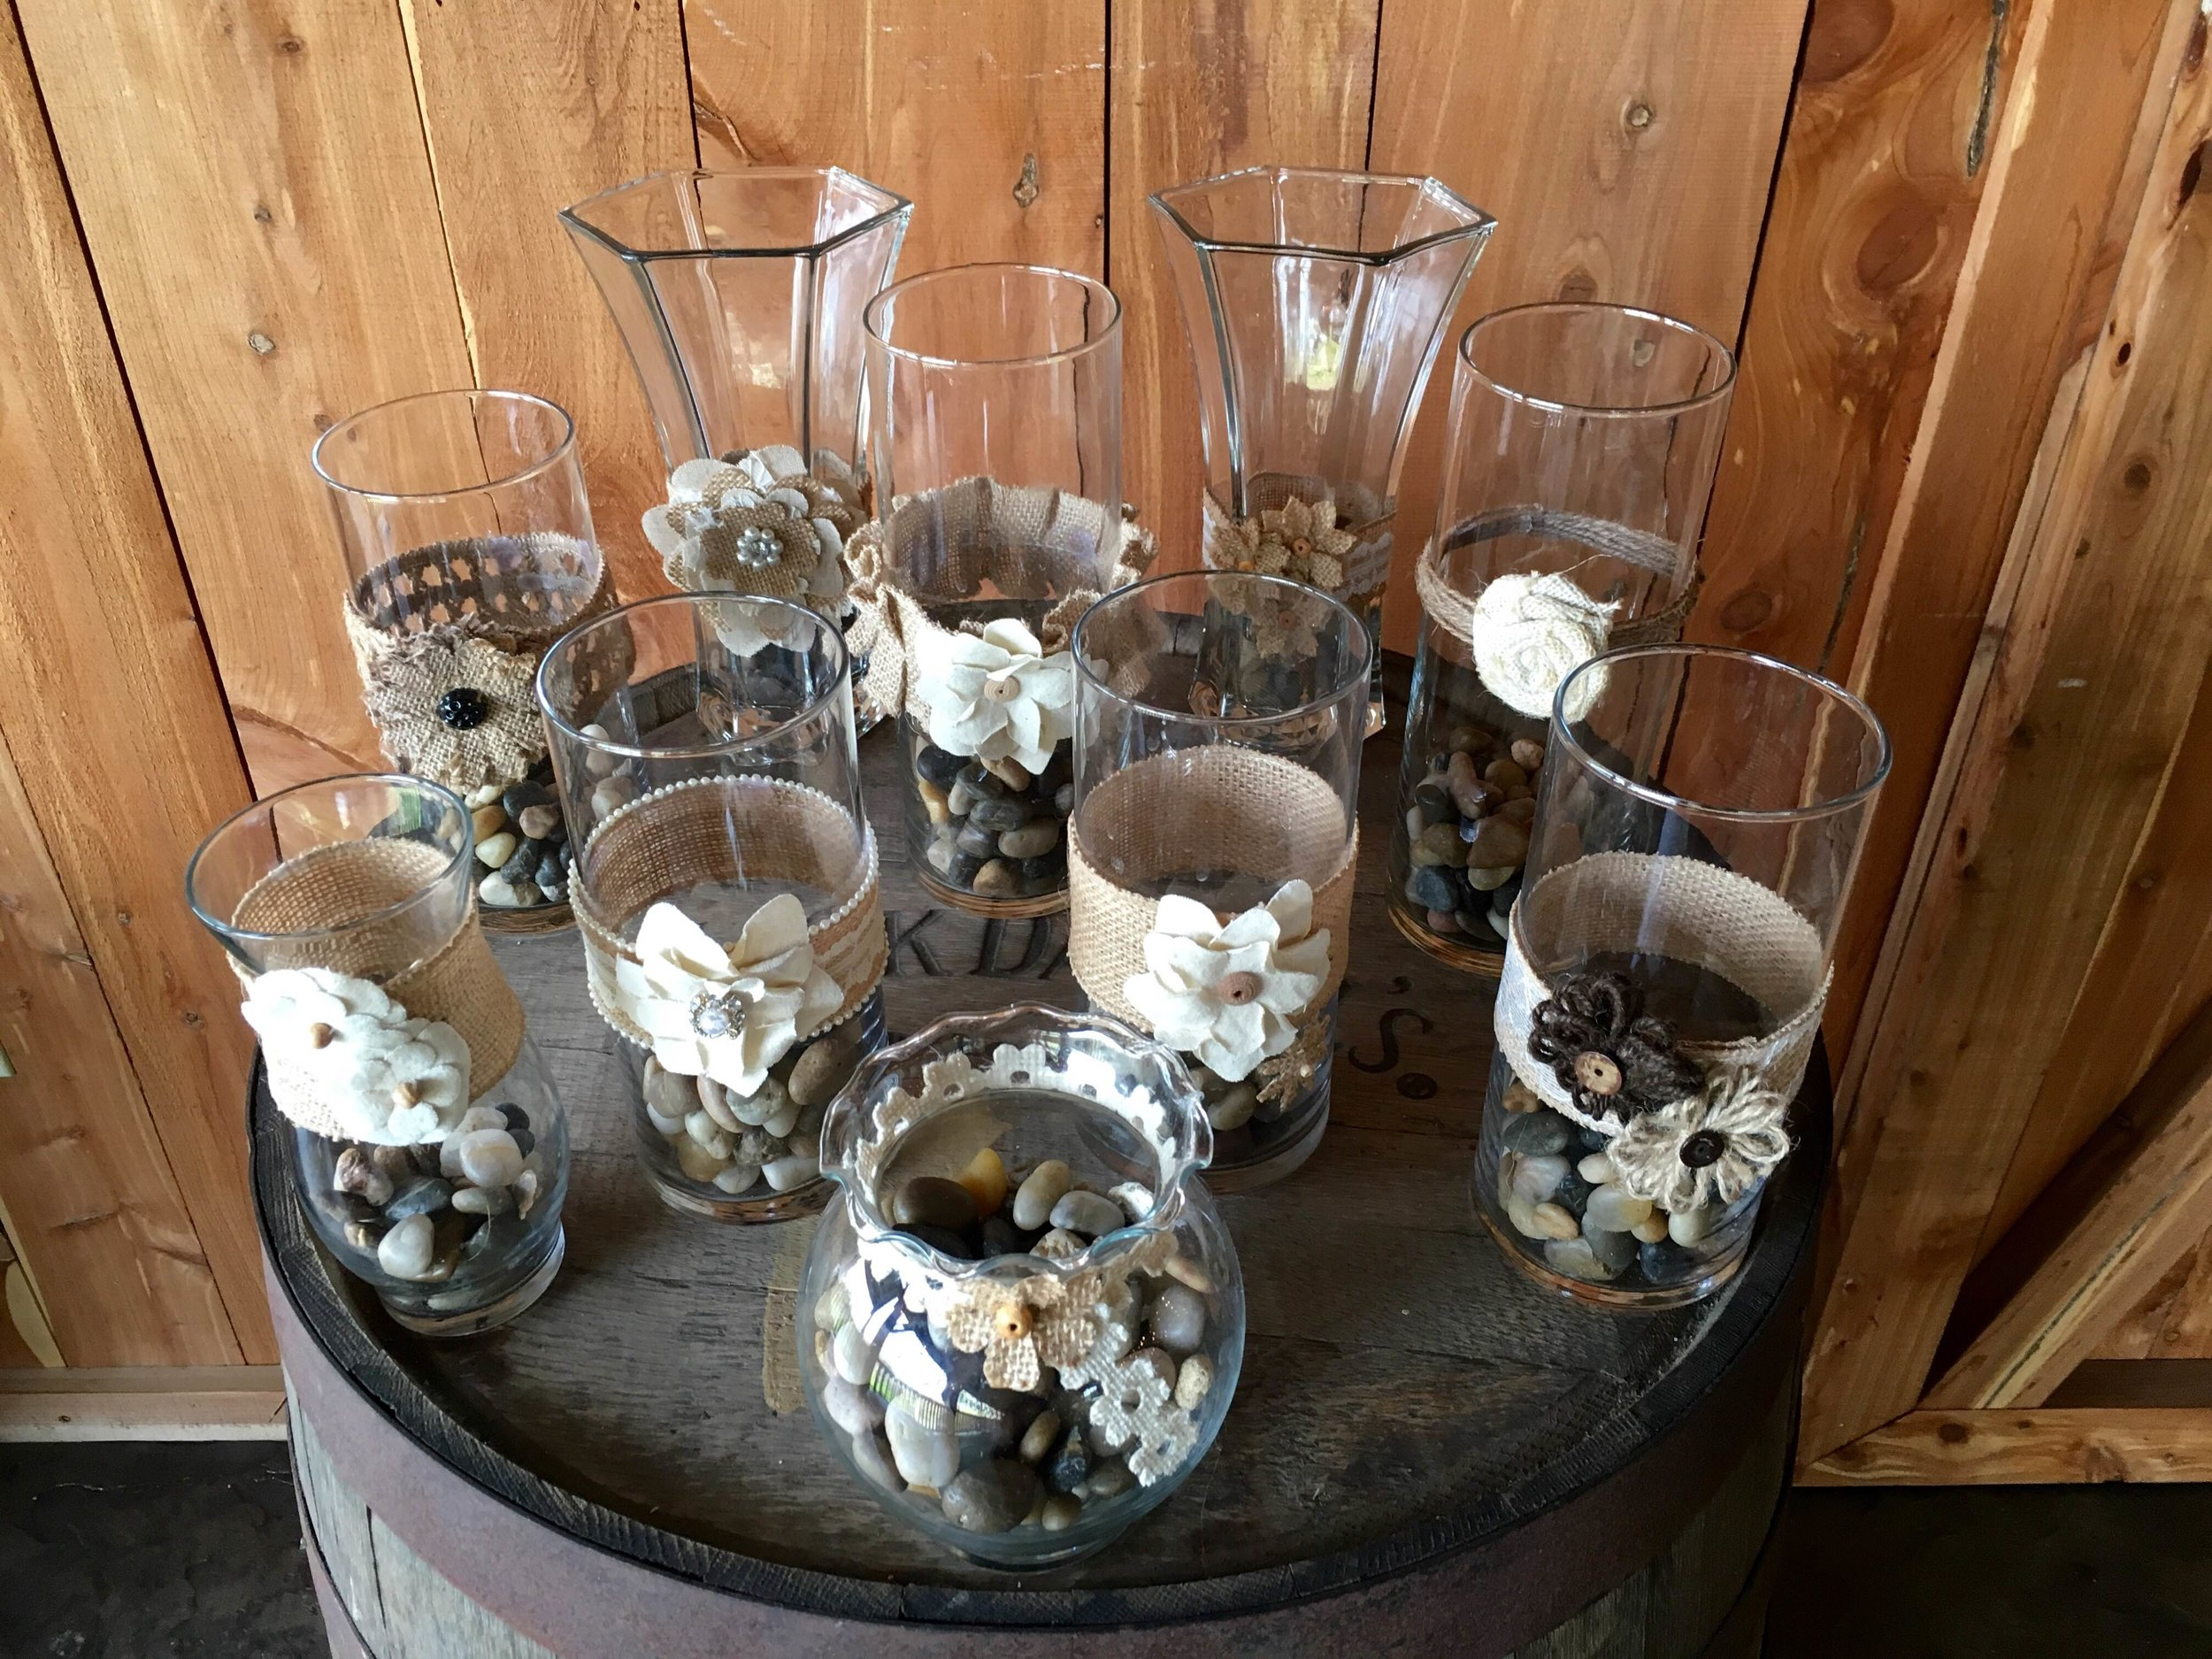 #179 - Rustic Jars and Rocks